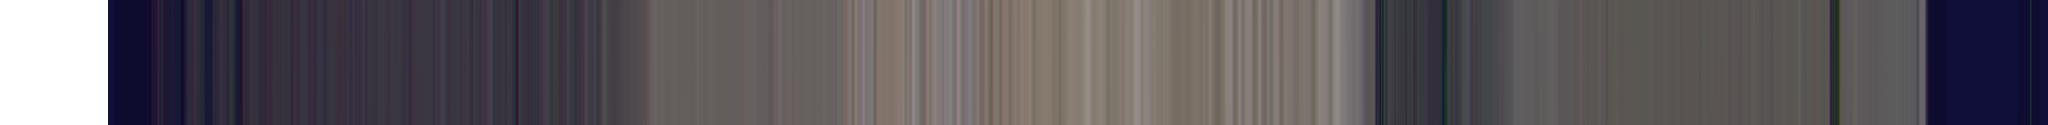 2k_saturn_ring_alpha | [Решено] Как натянуть текстуру на диск в Blender?